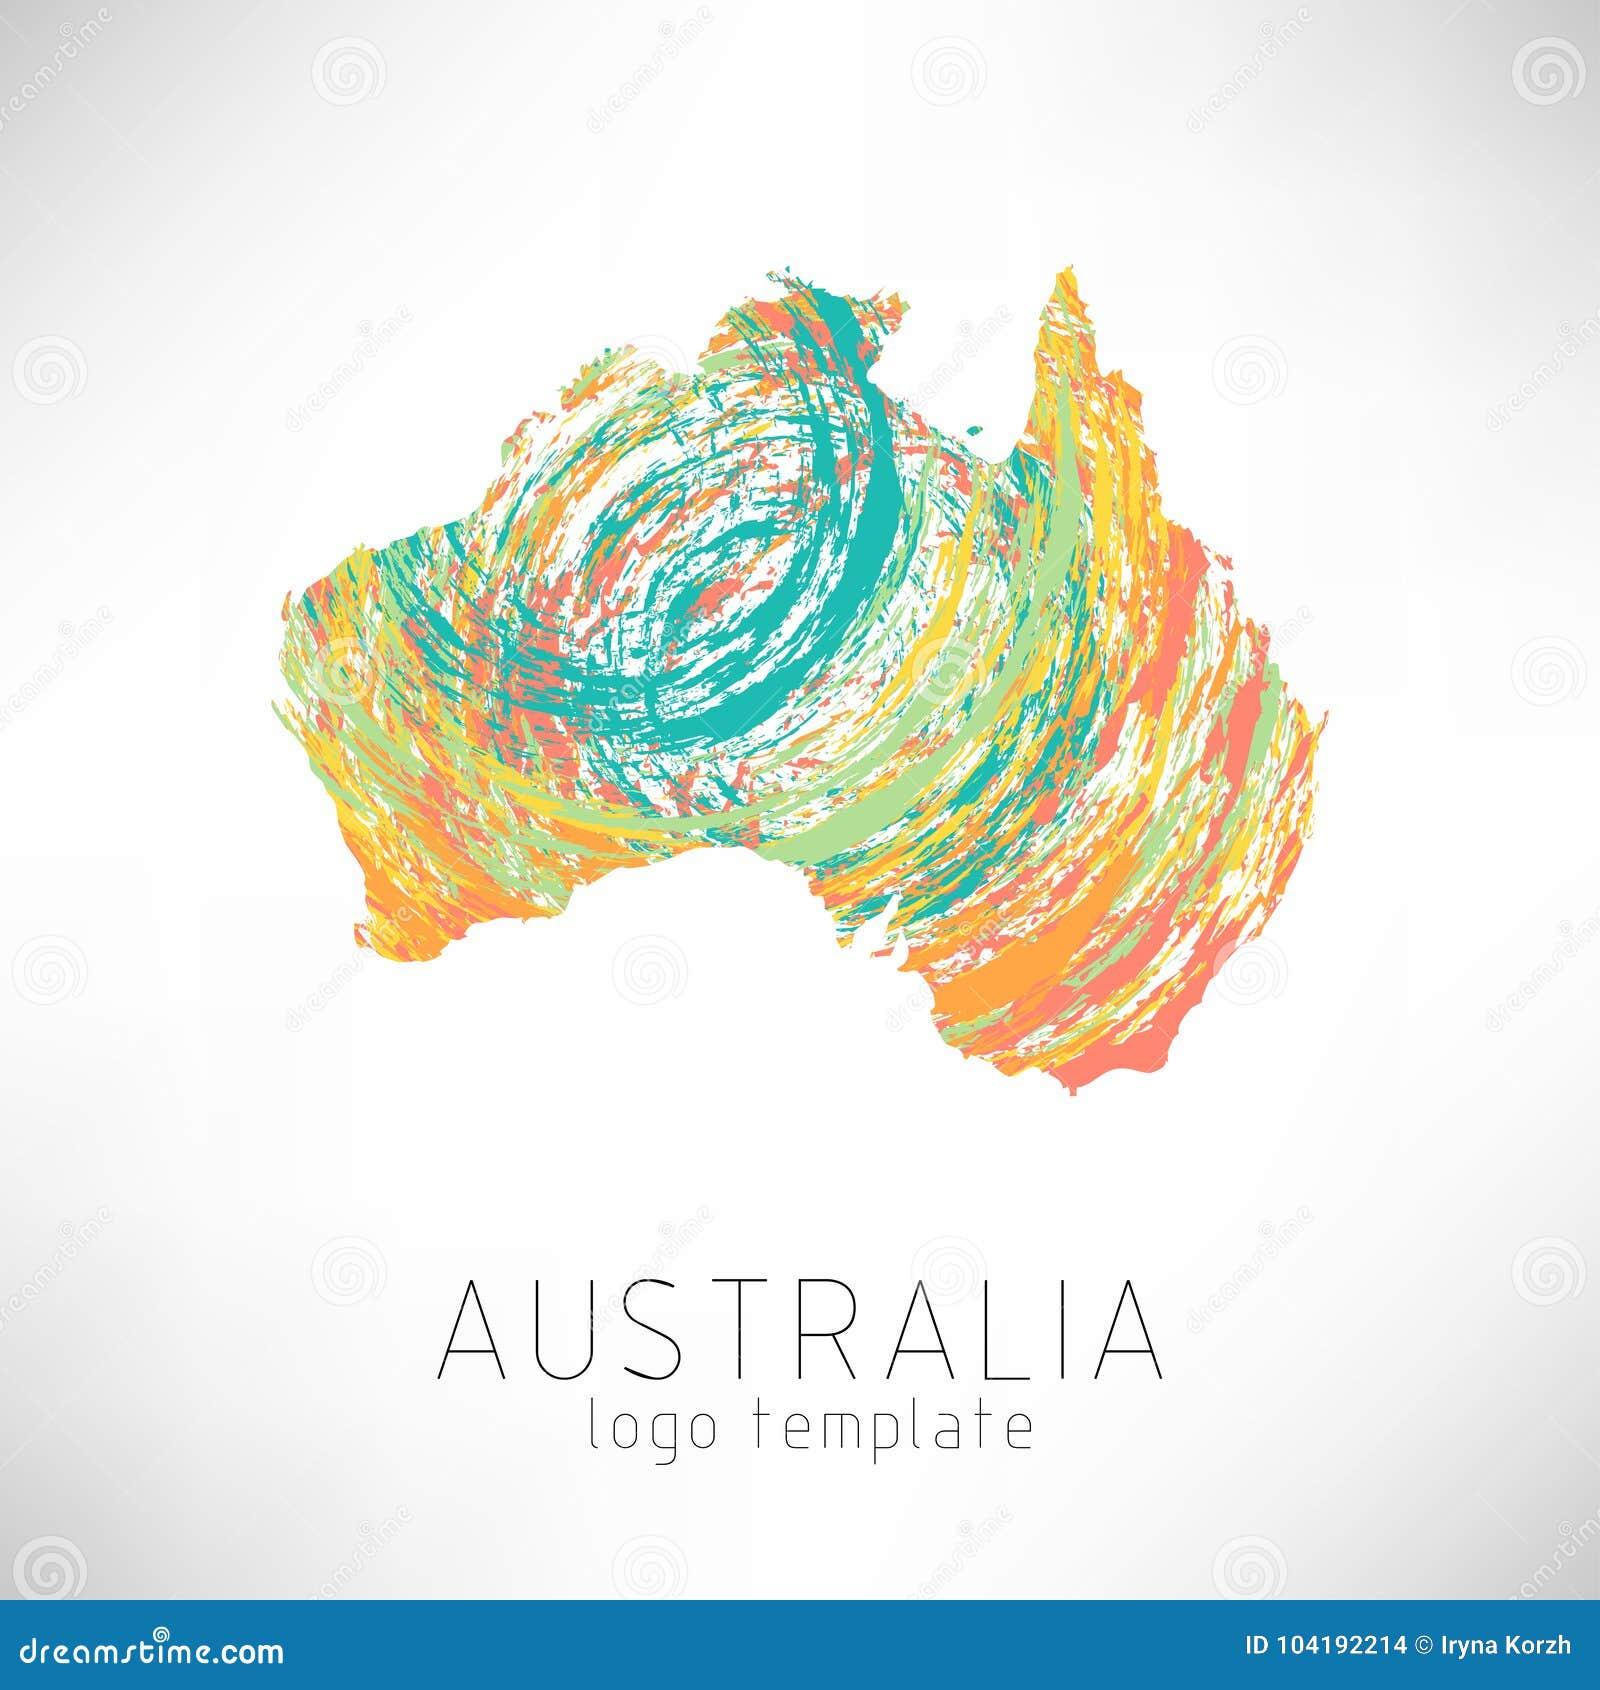 Australia Map Shape.Australia Creative Designed Silhouette Map Stock Illustration